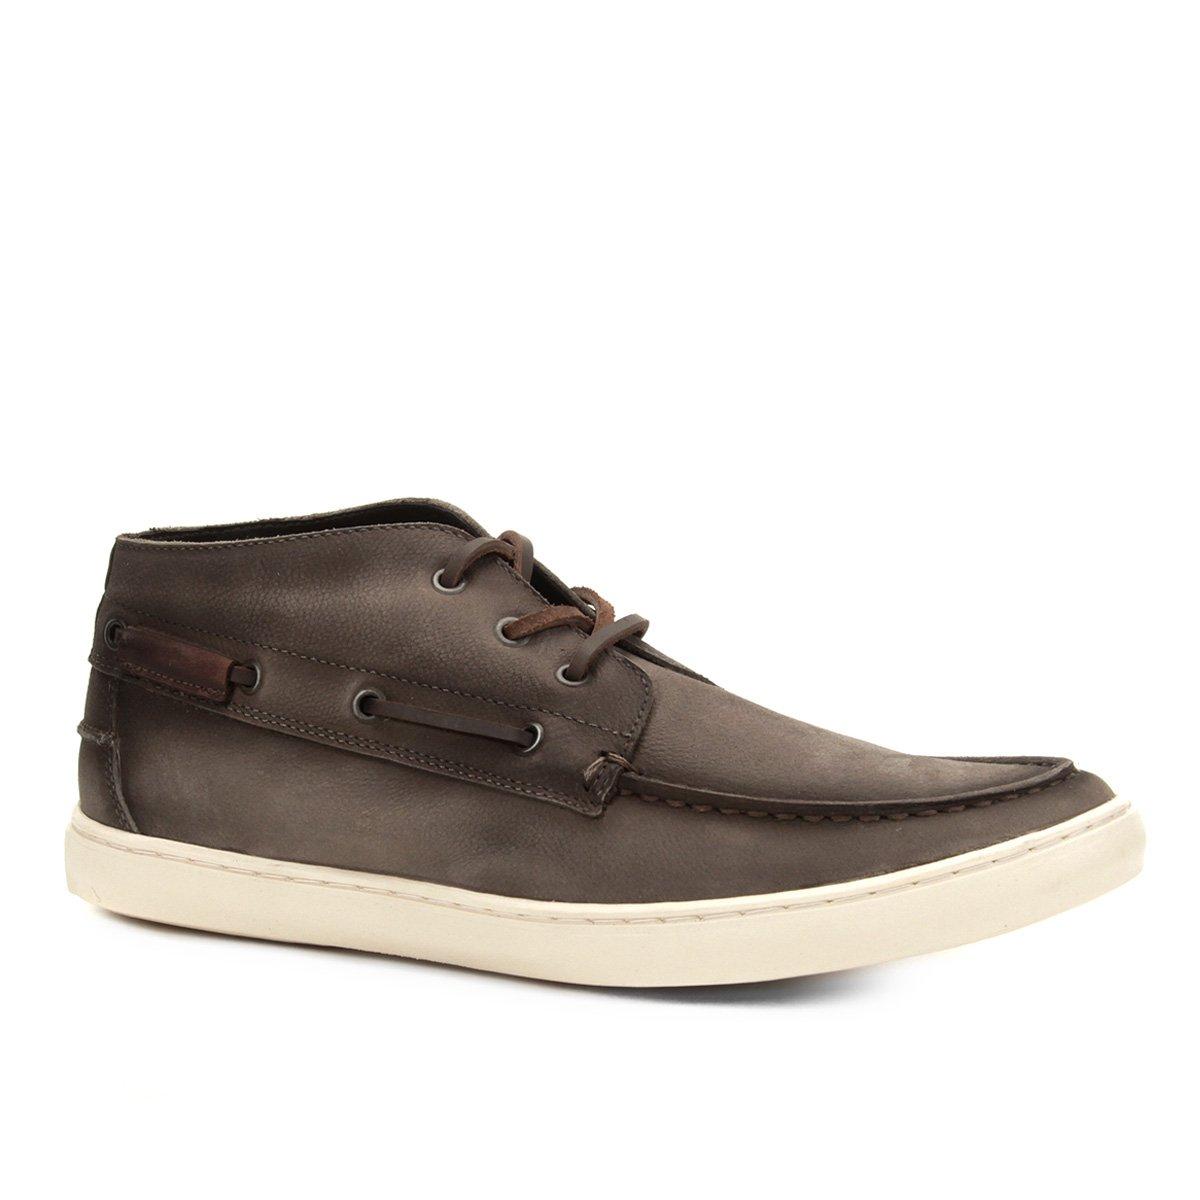 a64f329c7 Sapatênis Couro Shoestock Sider Stoned Cano Alto Masculino   Shoestock